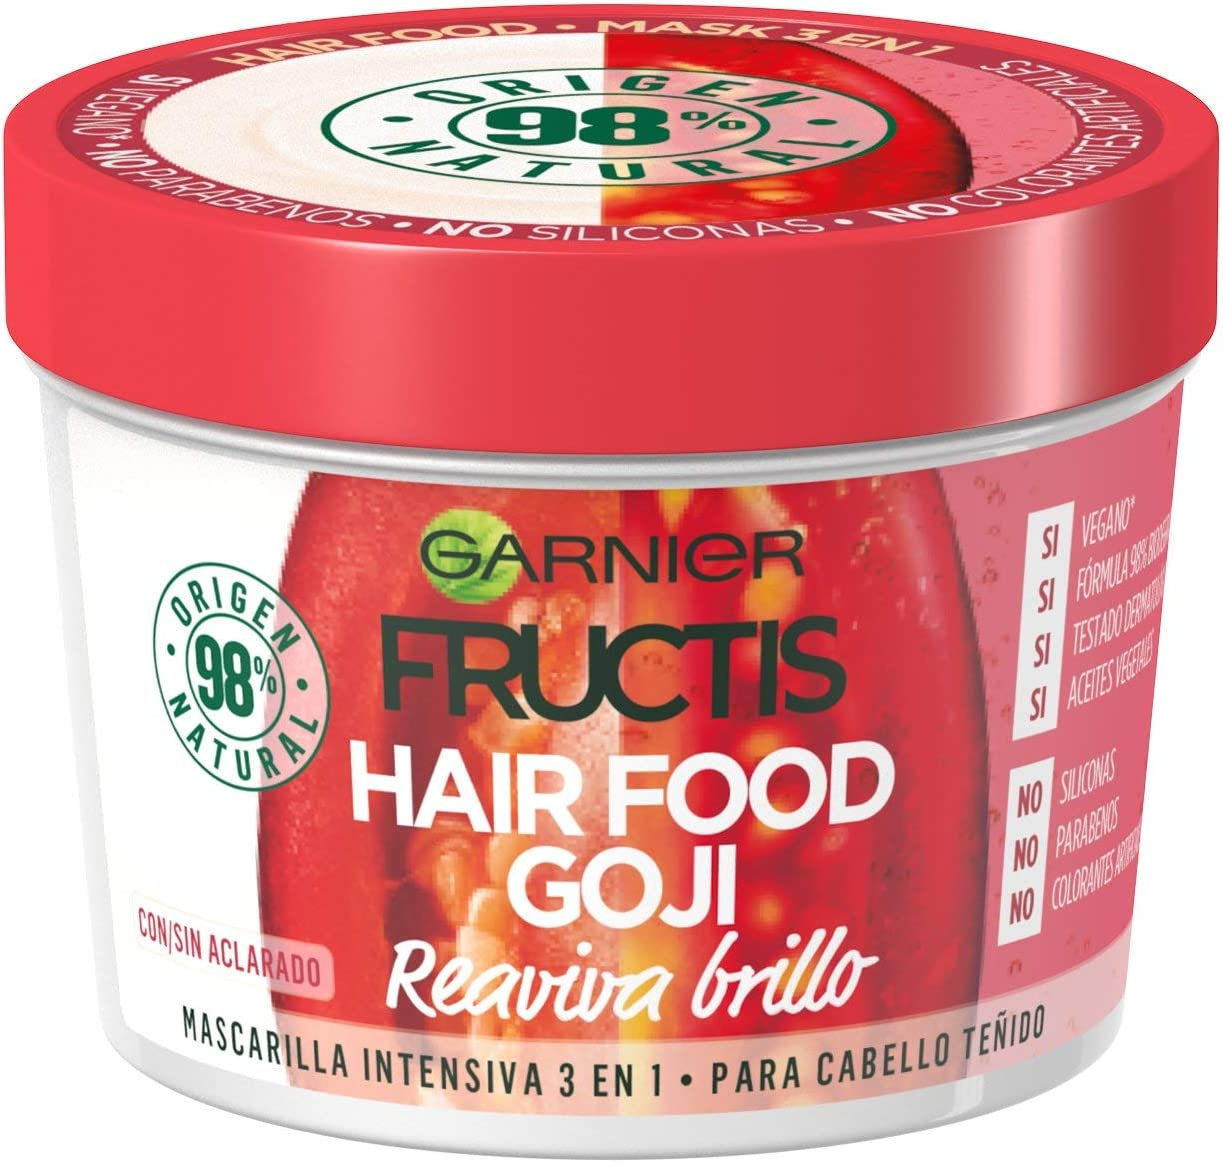 Garnier Fructis Hair Food Goji Mascarilla Reaviva el Brillo 3 en 1 - 390 ml